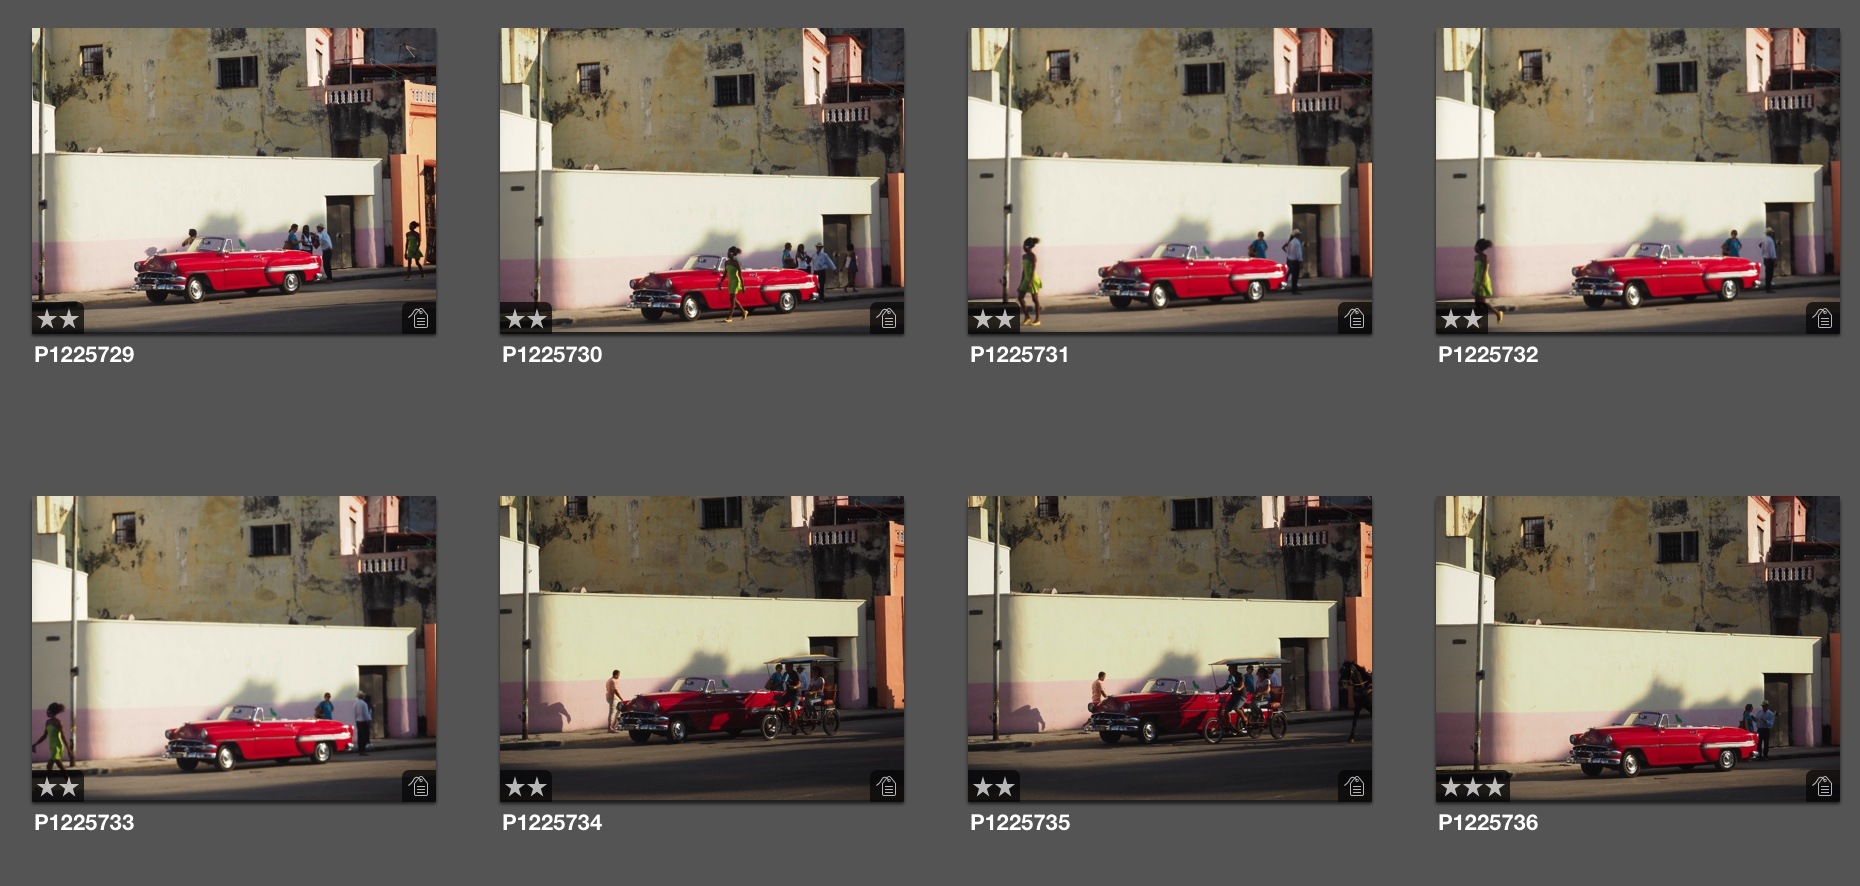 http://thedigitalstory.com/2015/02/07/red-car-series-havana.jpg